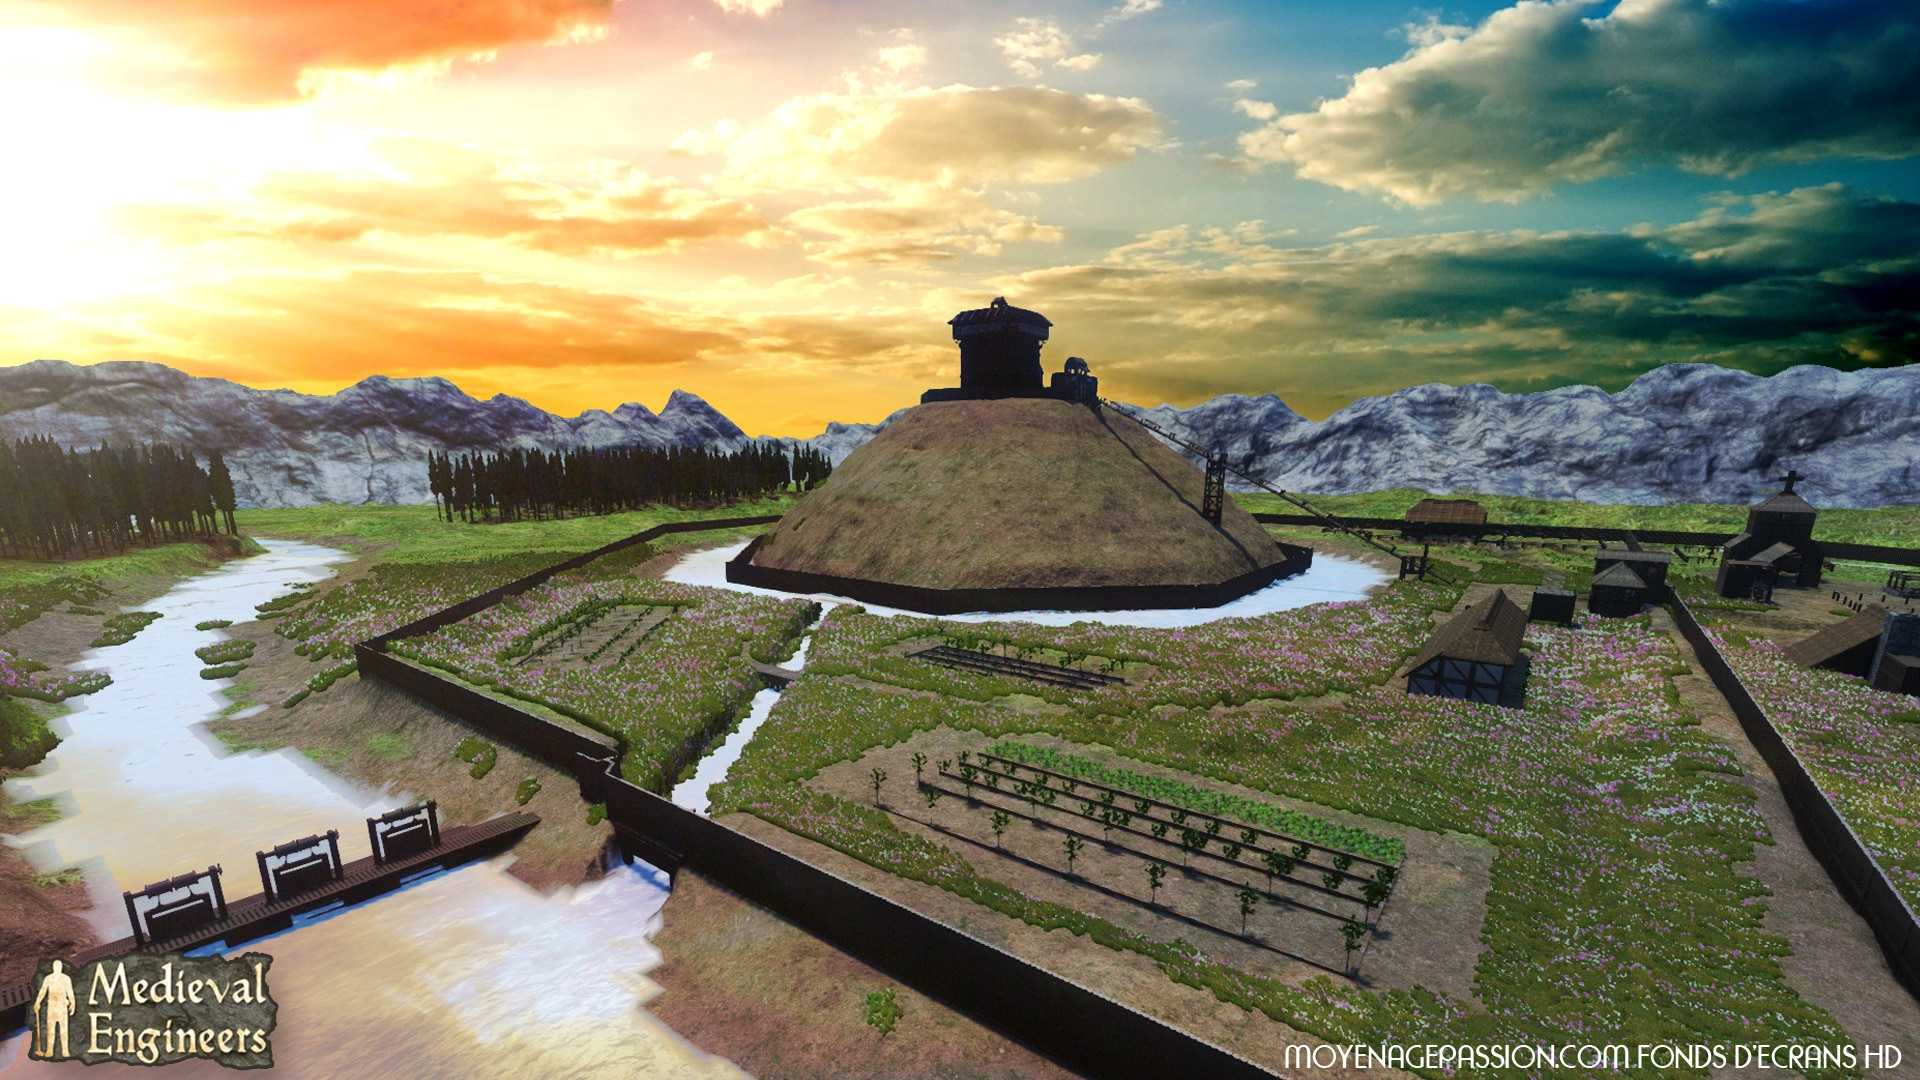 motte_feodale_chateau-fort_fond_ecran_gratuit_moyen-age_archeologie_medieval_engineers